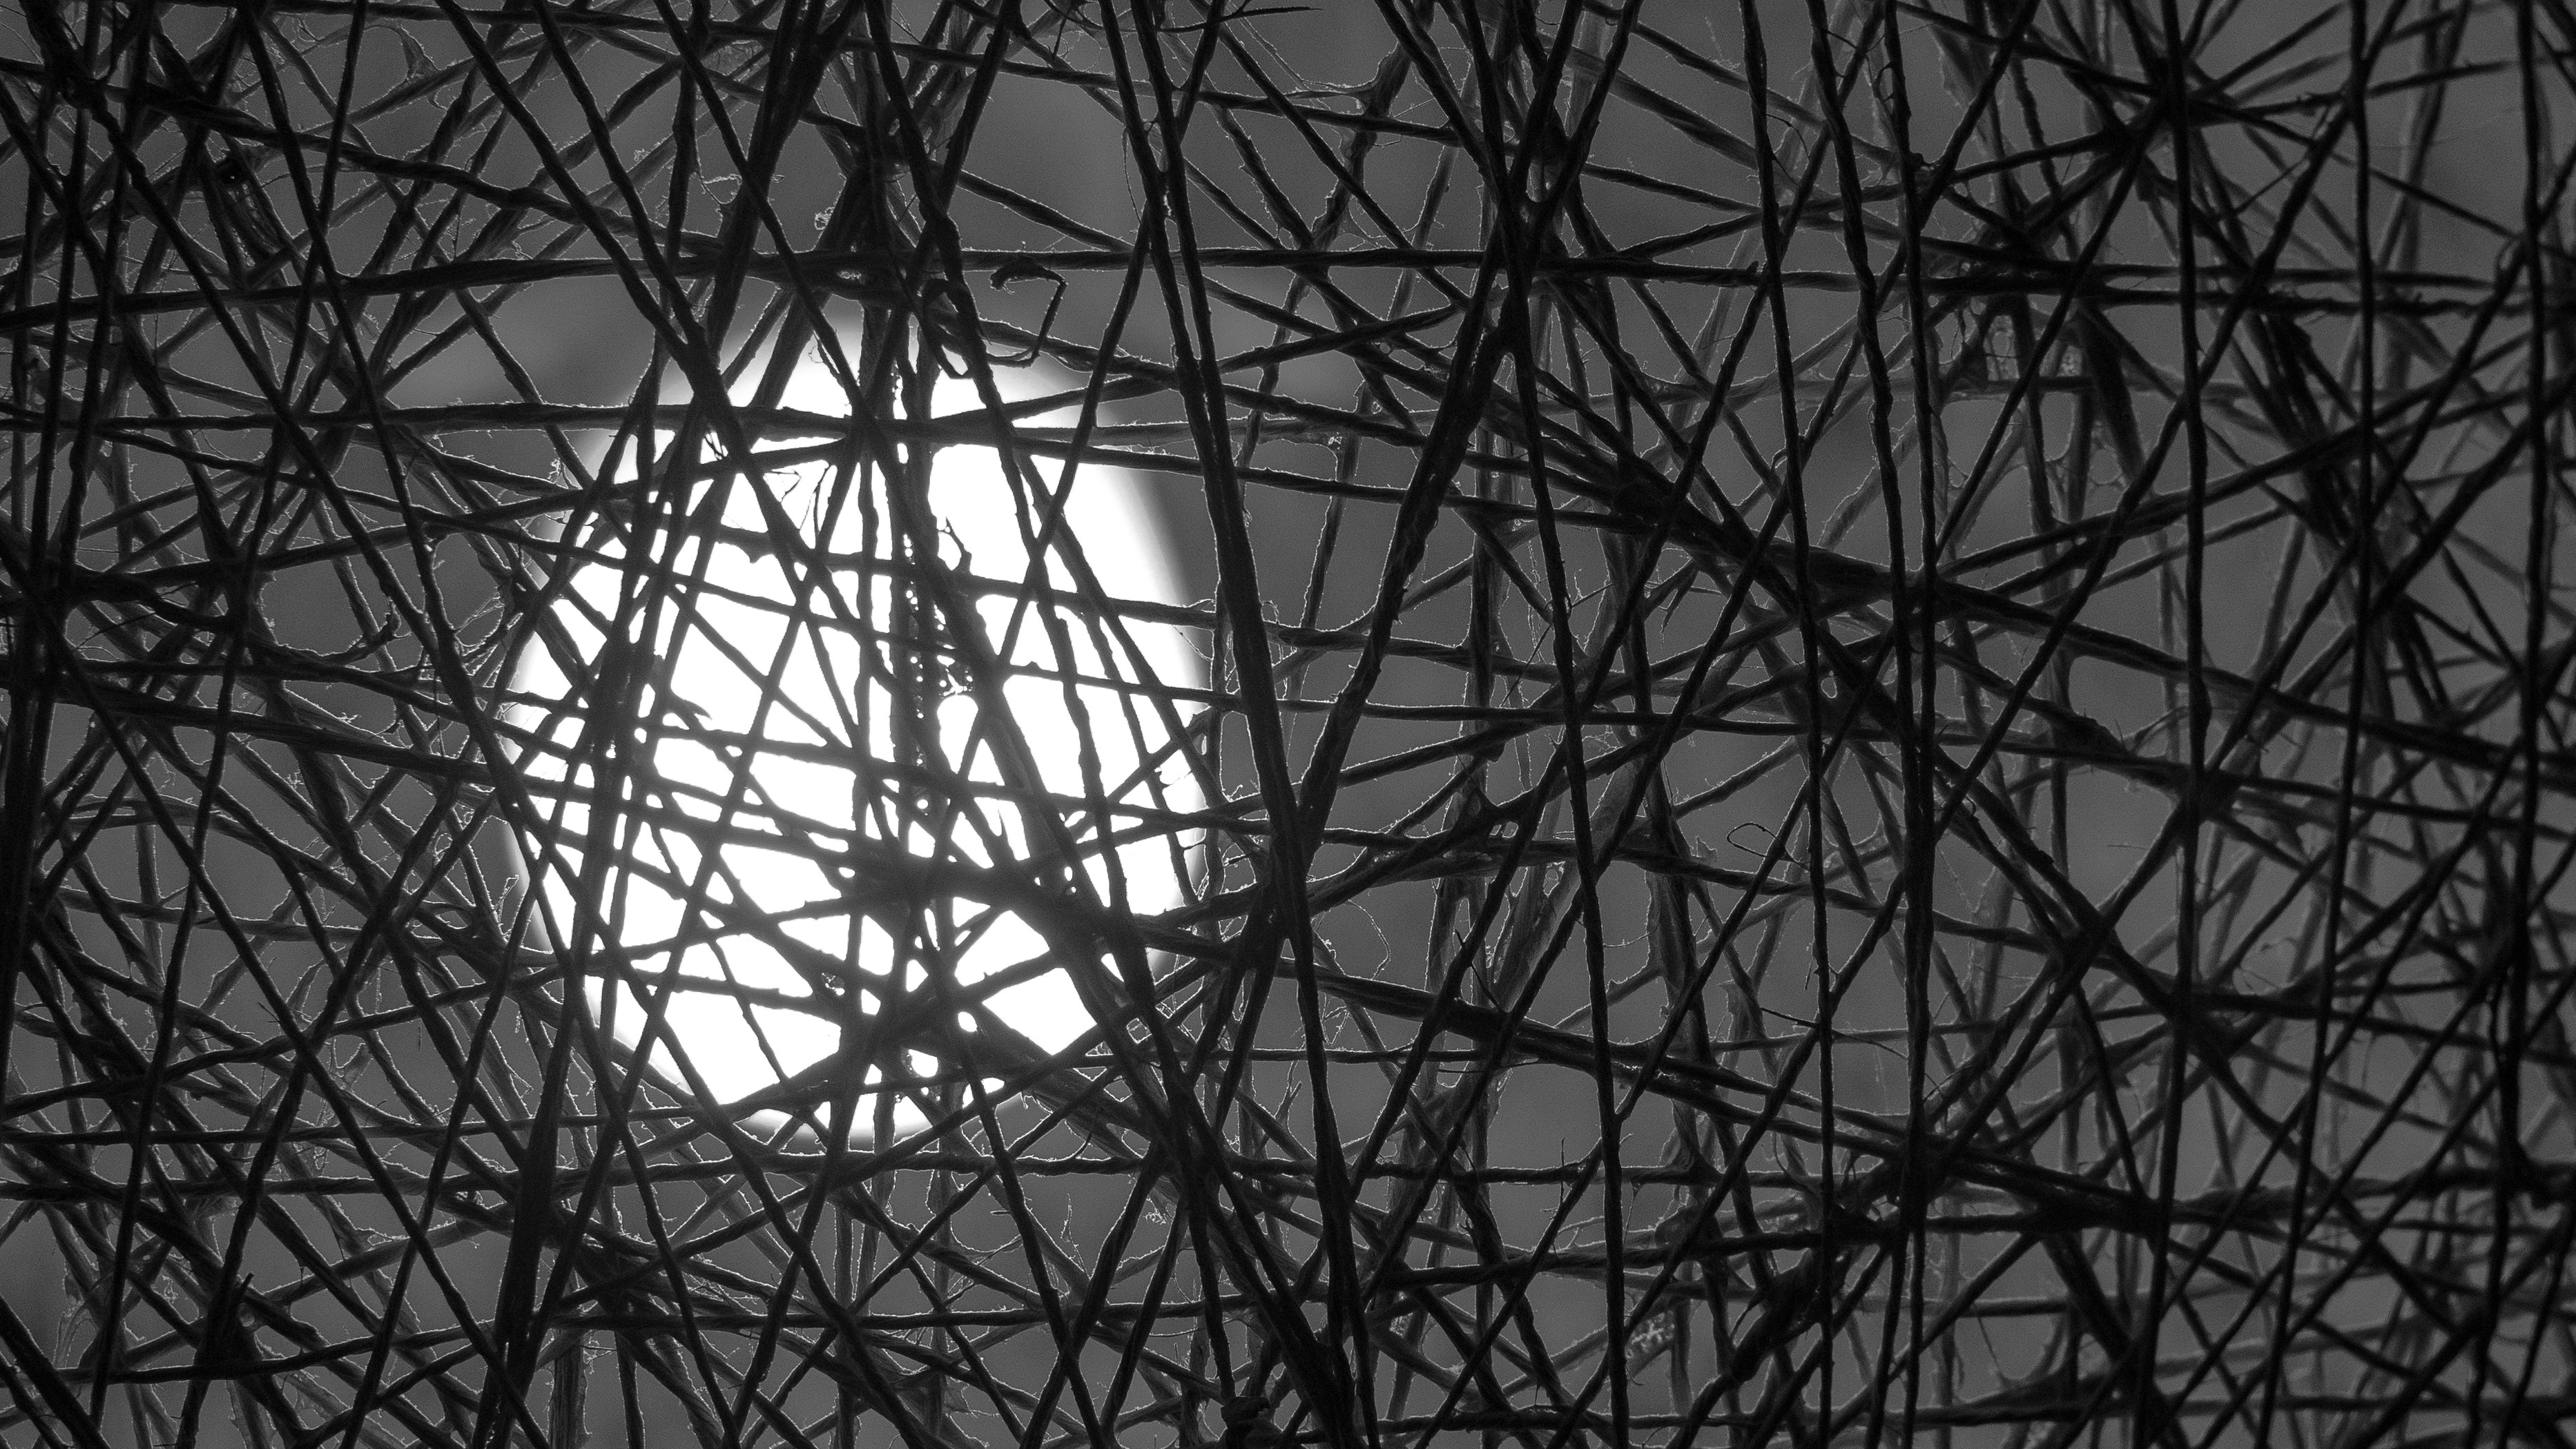 network moon16x9.jpg